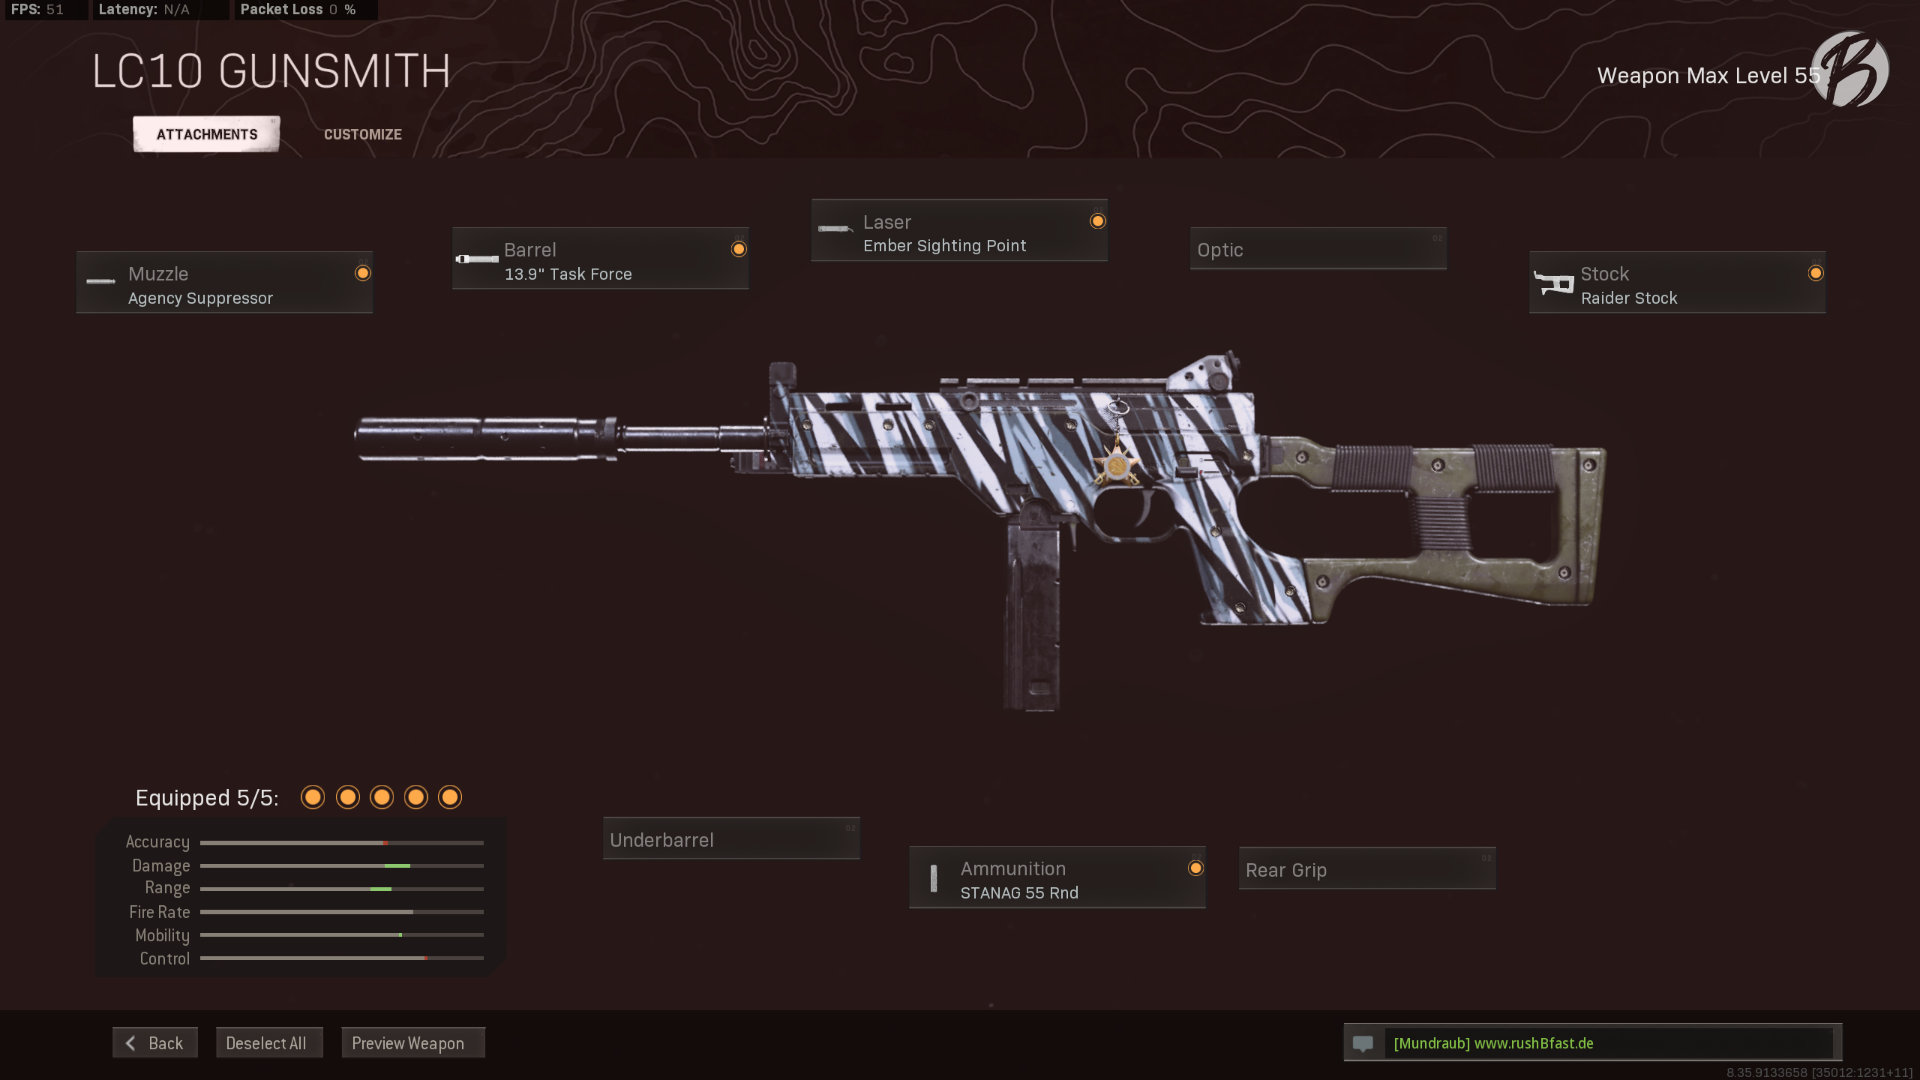 Call of Duty Warzone - Cold War Season 3 - LC10